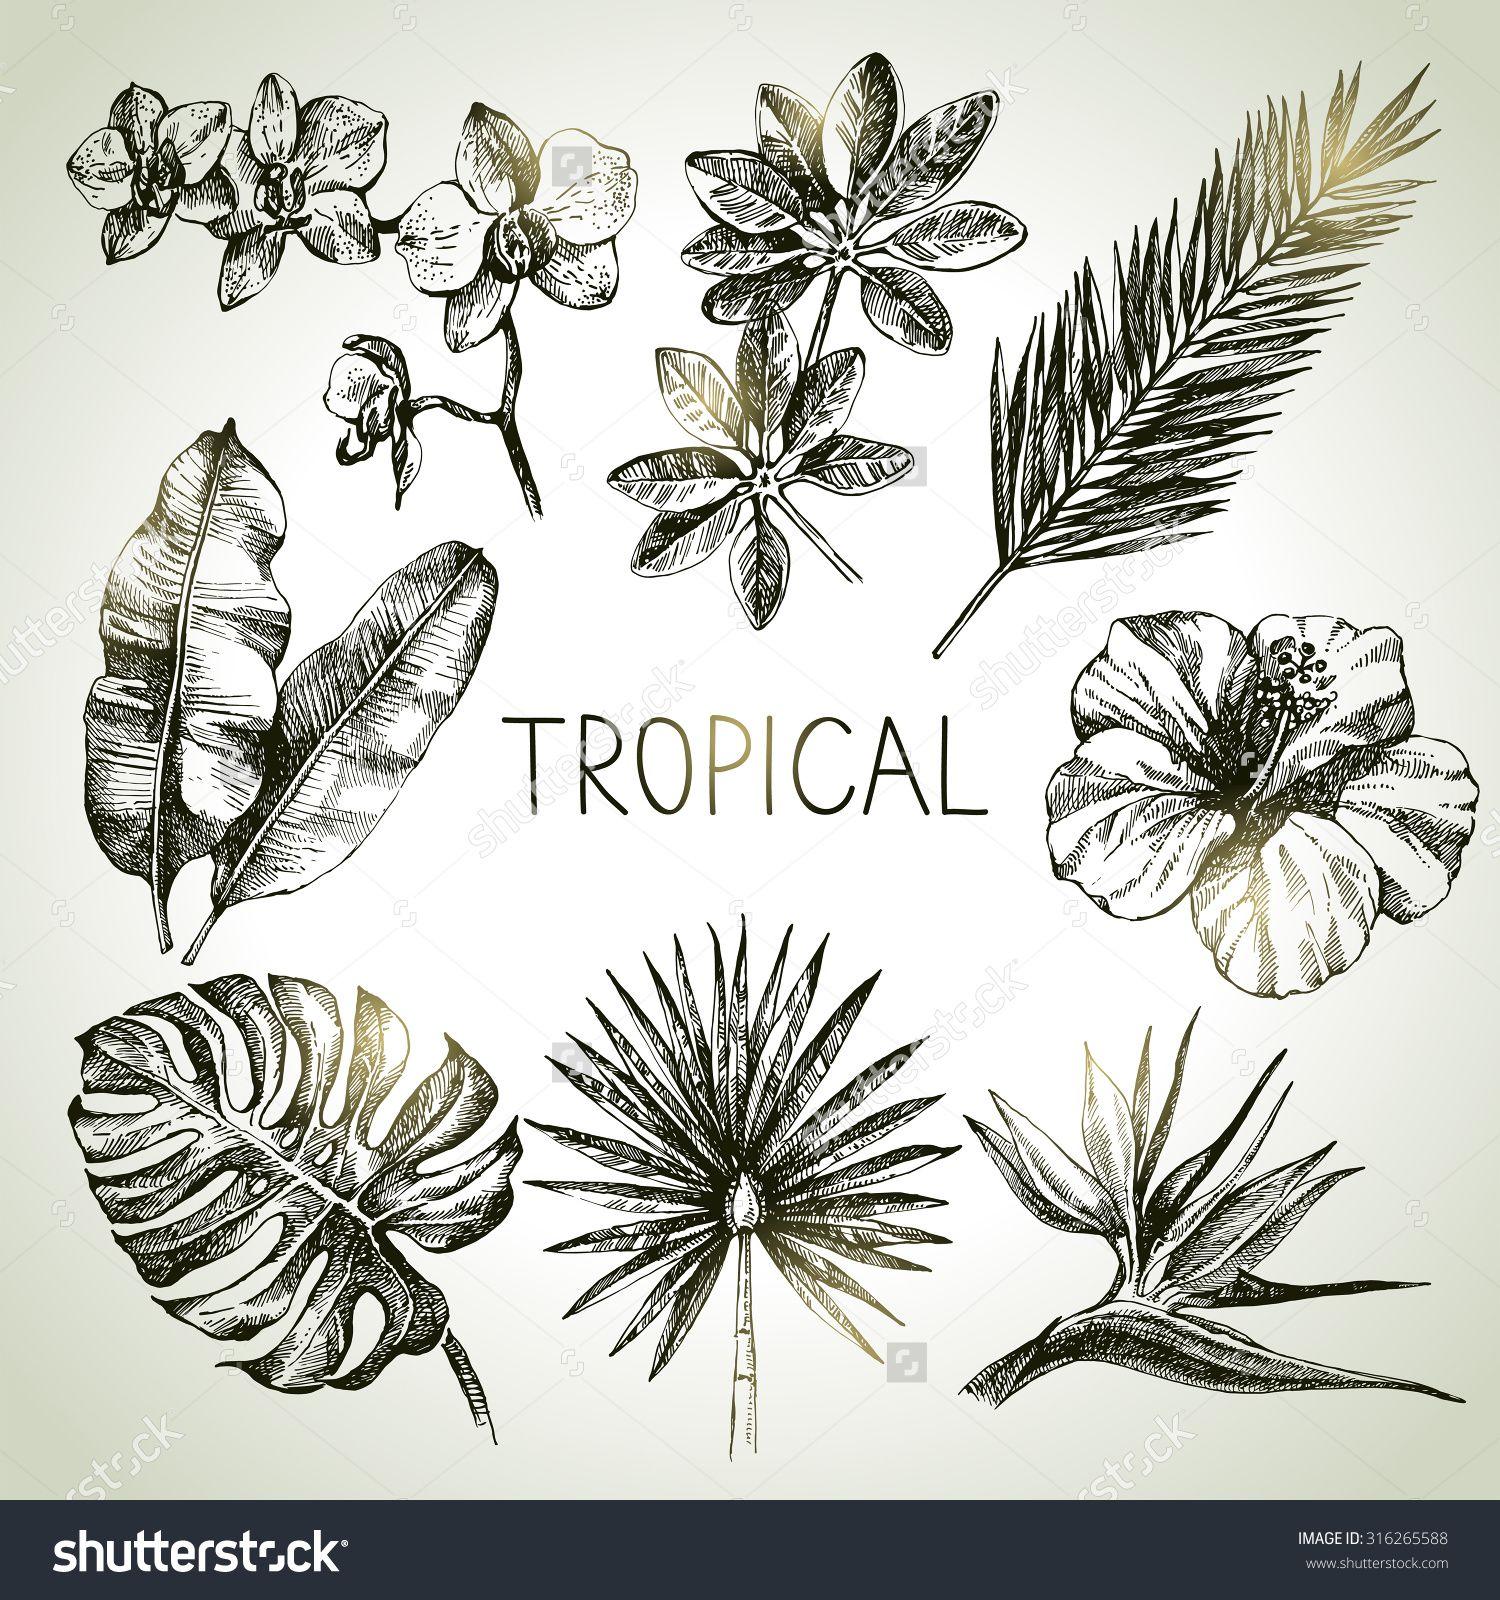 Hand Drawn Sketch Tropical Plants Set. Vector Illustrations - 316265588 : Shutterstock